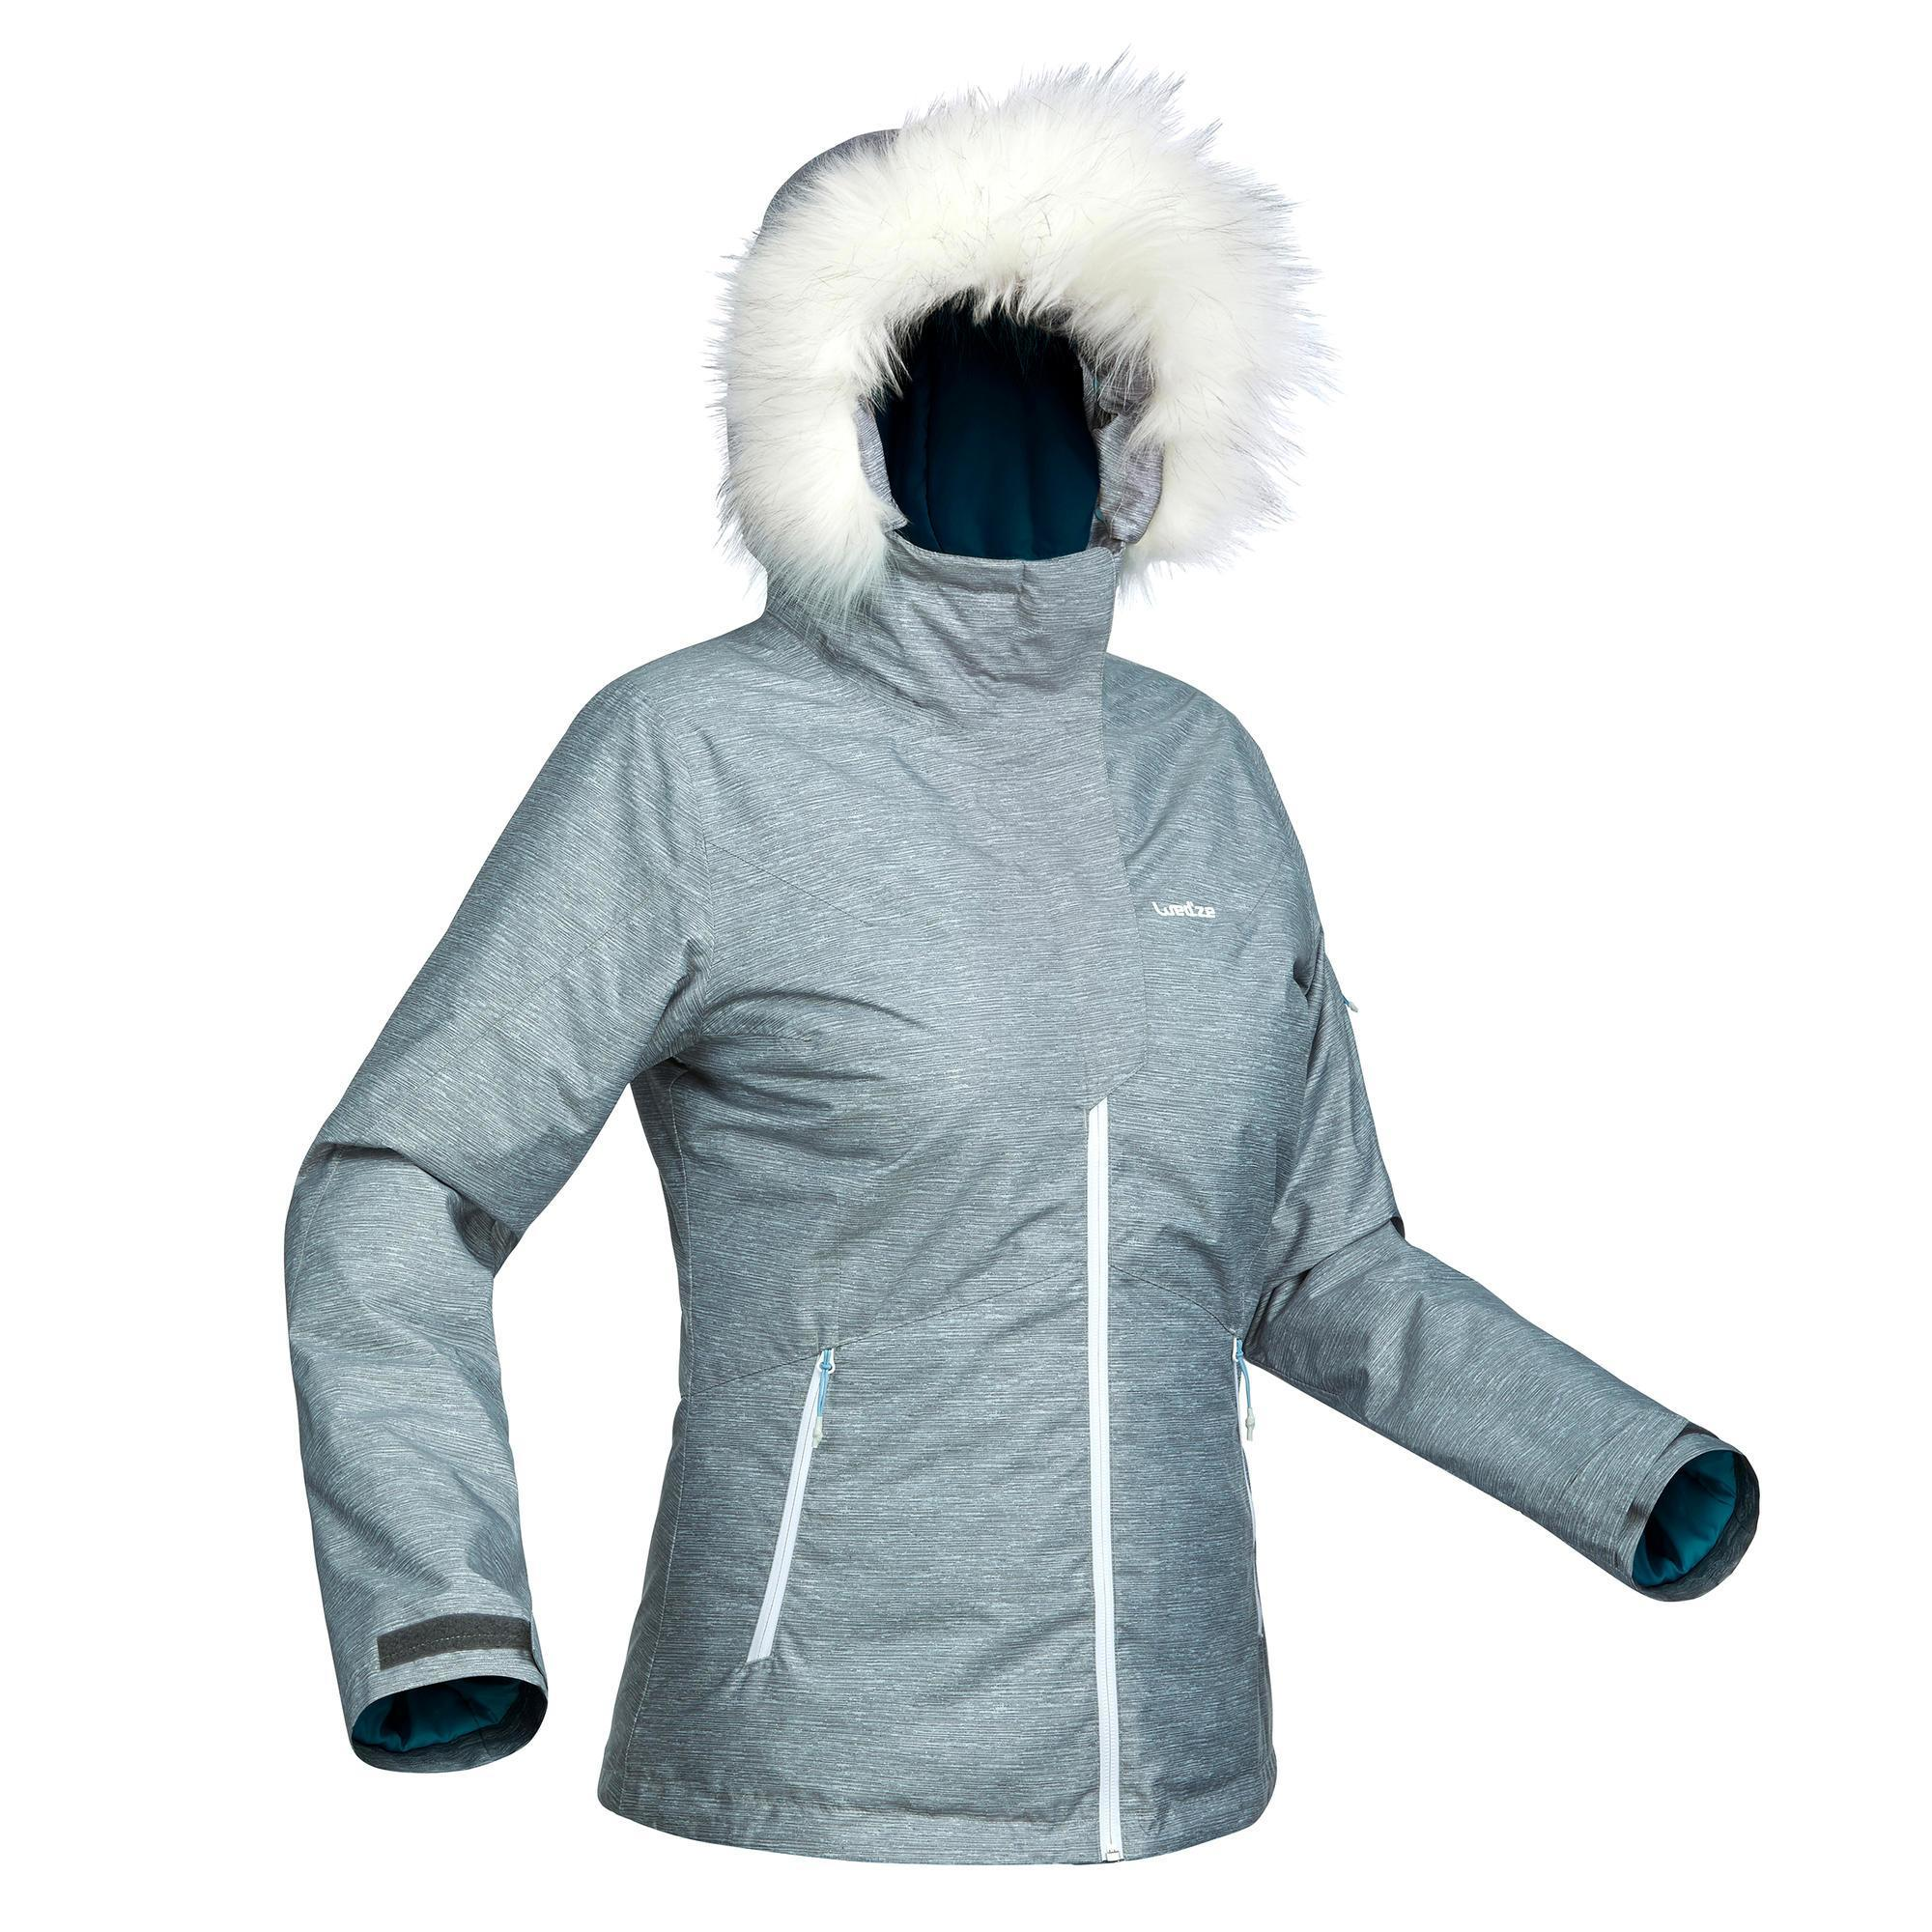 Wed'ze Dames ski-jas voor pisteskiën SKI-P JKT 150